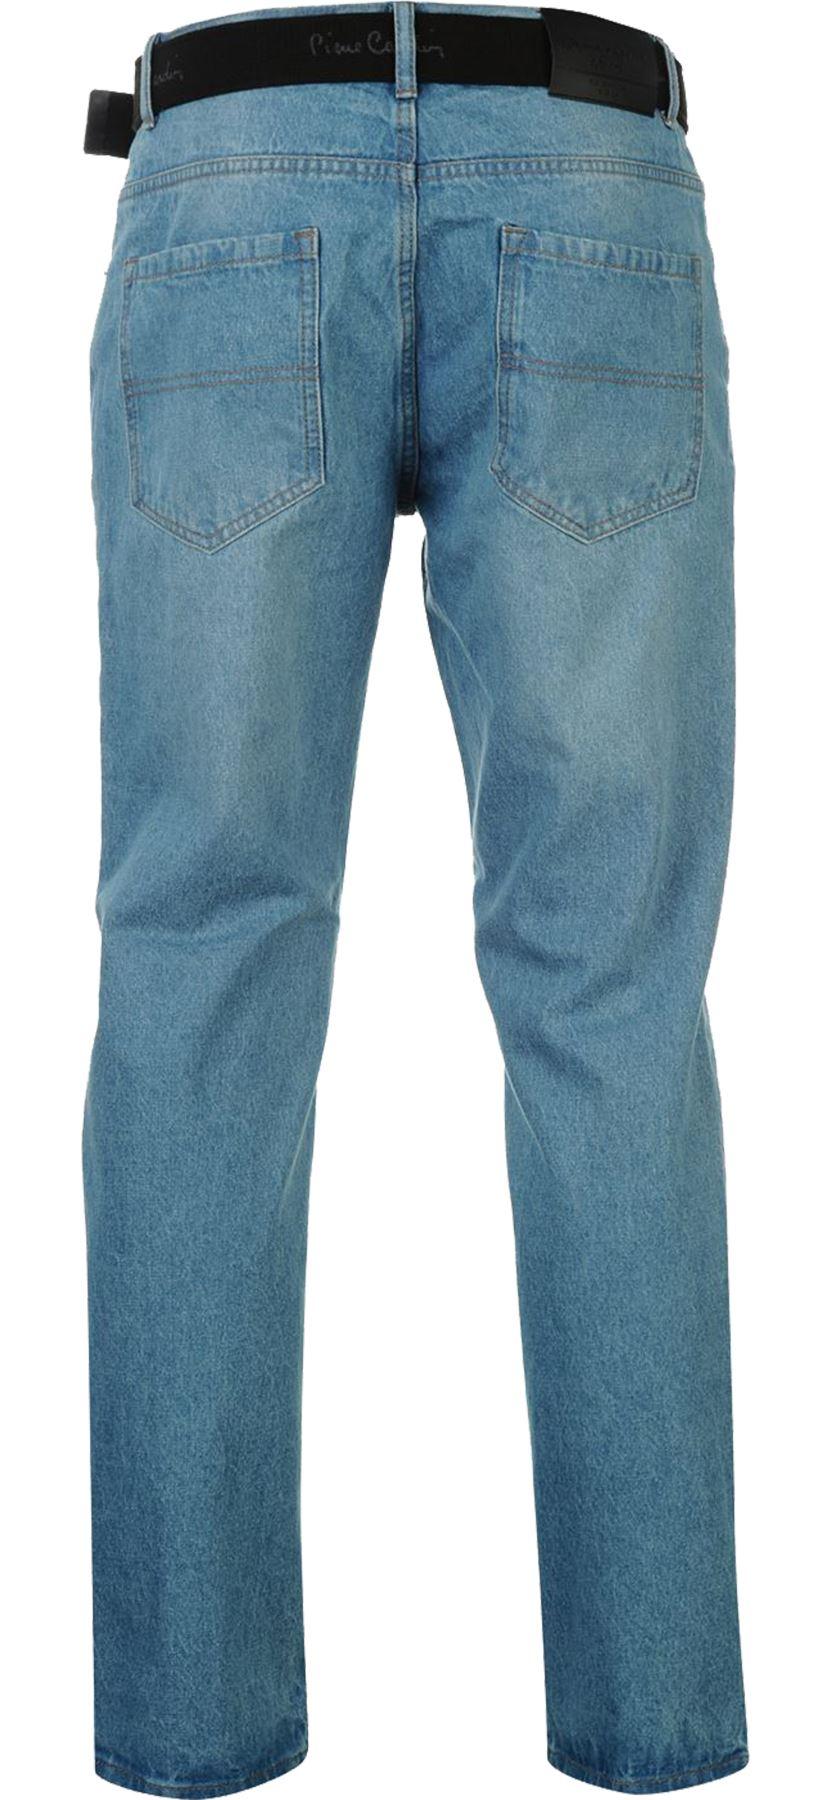 Mens-Belted-Denim-Jeans-Straight-Leg-Regular-Fit-Pierre-Cardin-Pants-Big-Tall thumbnail 12